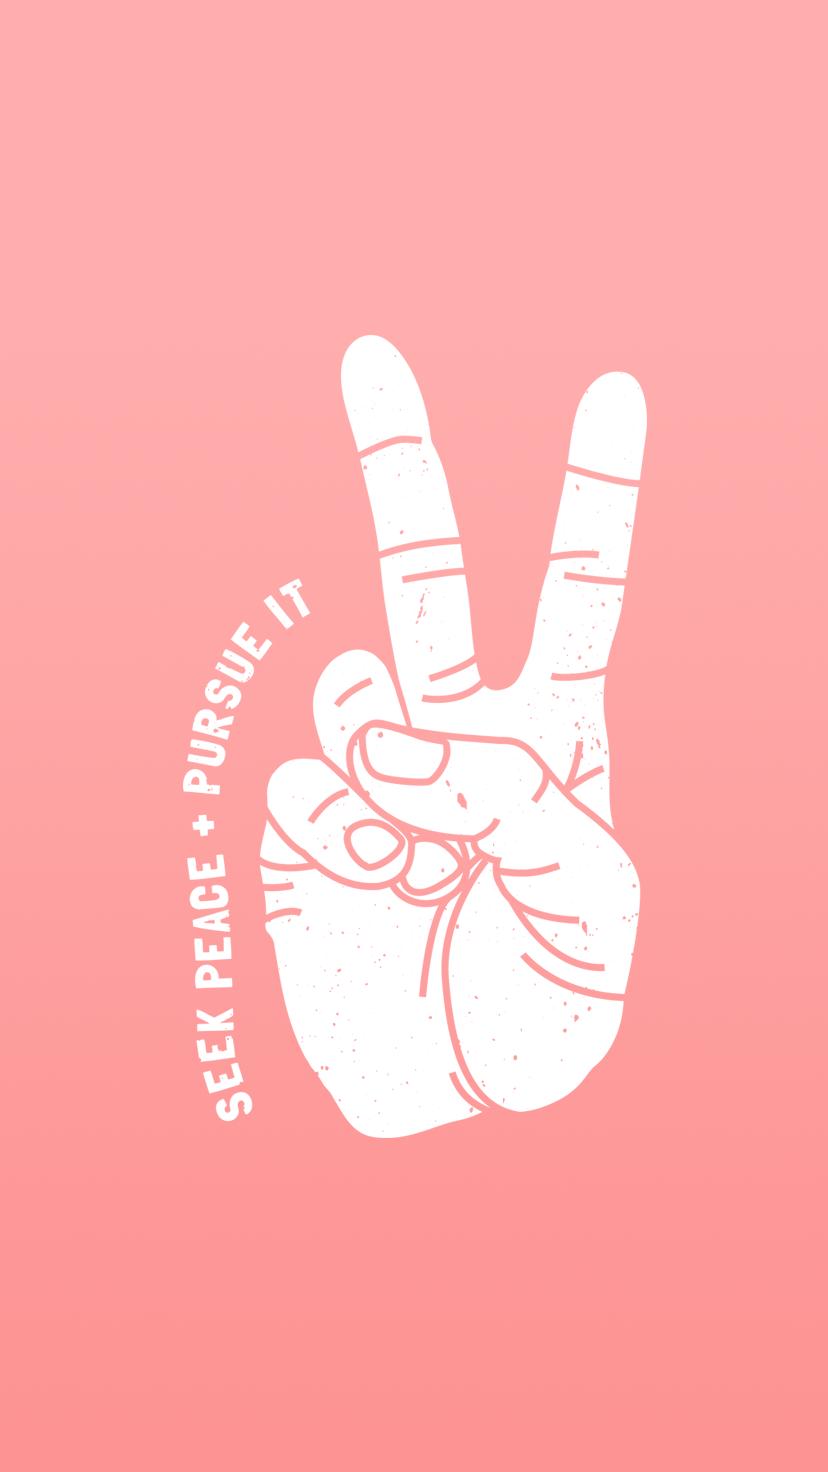 Seek-Peace-Phone-Wallpaper.png